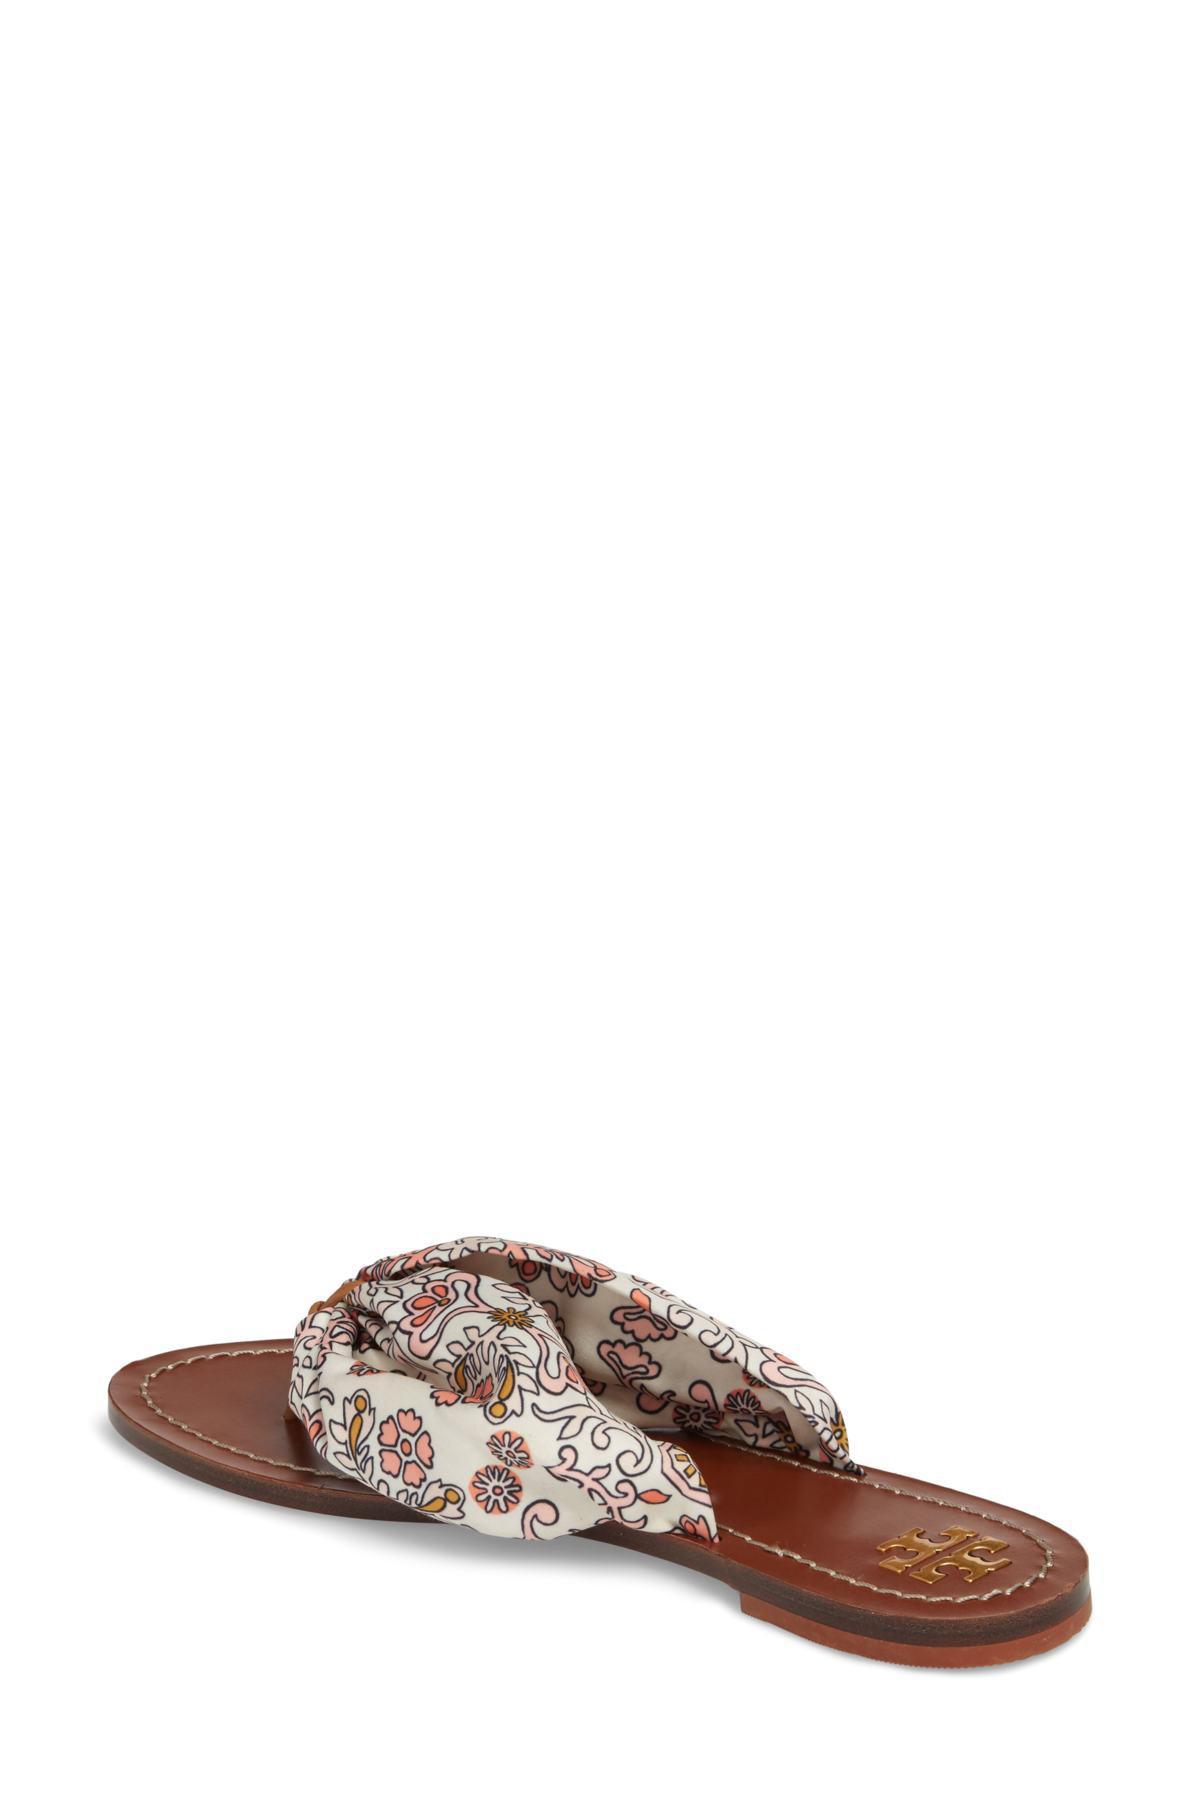 3c5000b8e817 Lyst - Tory Burch Carson Printed Satin Sandals